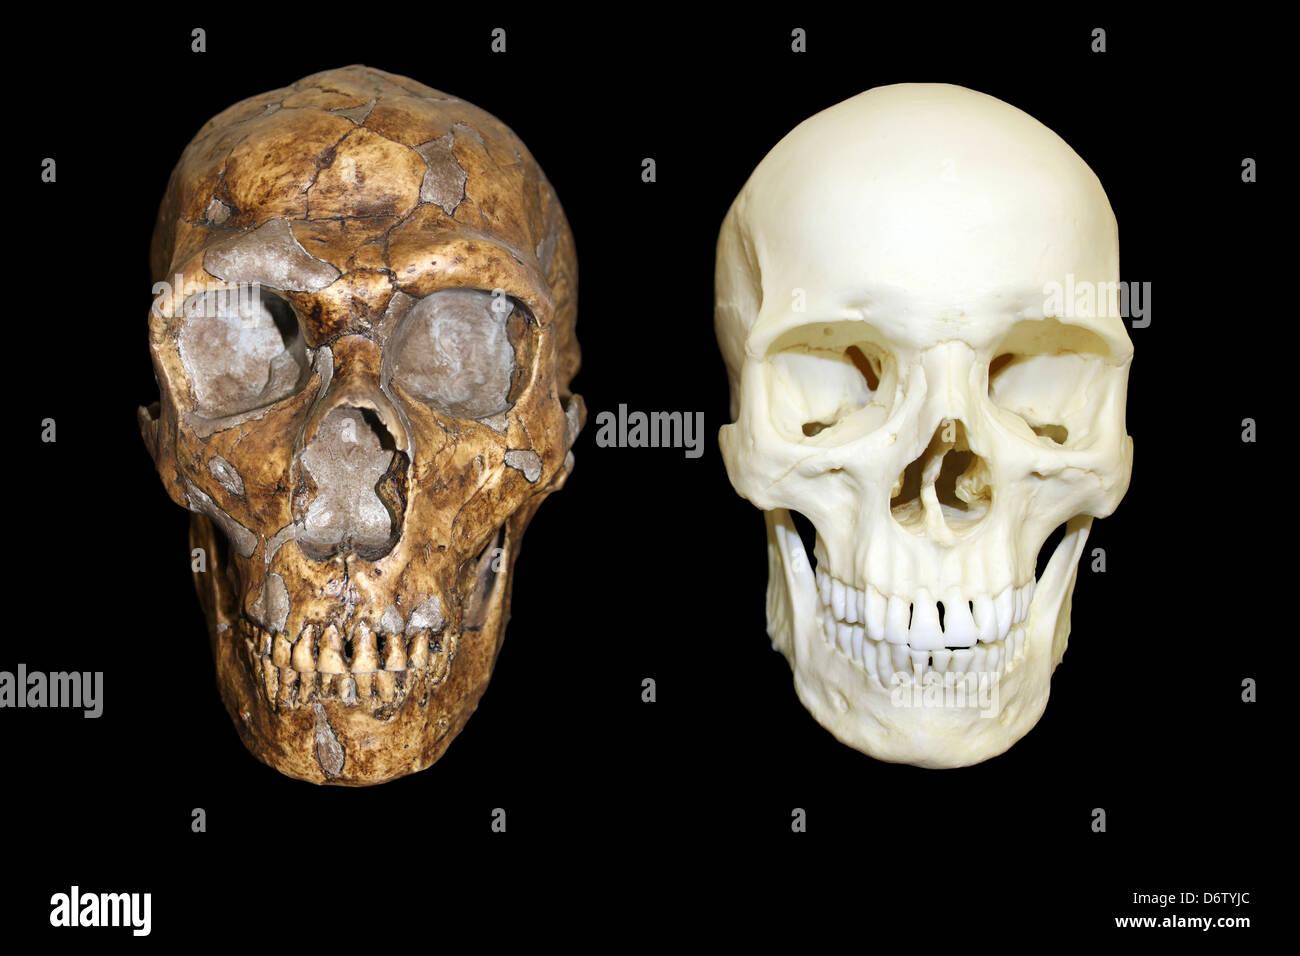 Homo neanderthalensis vs Homo sapiens Skull - Stock Image